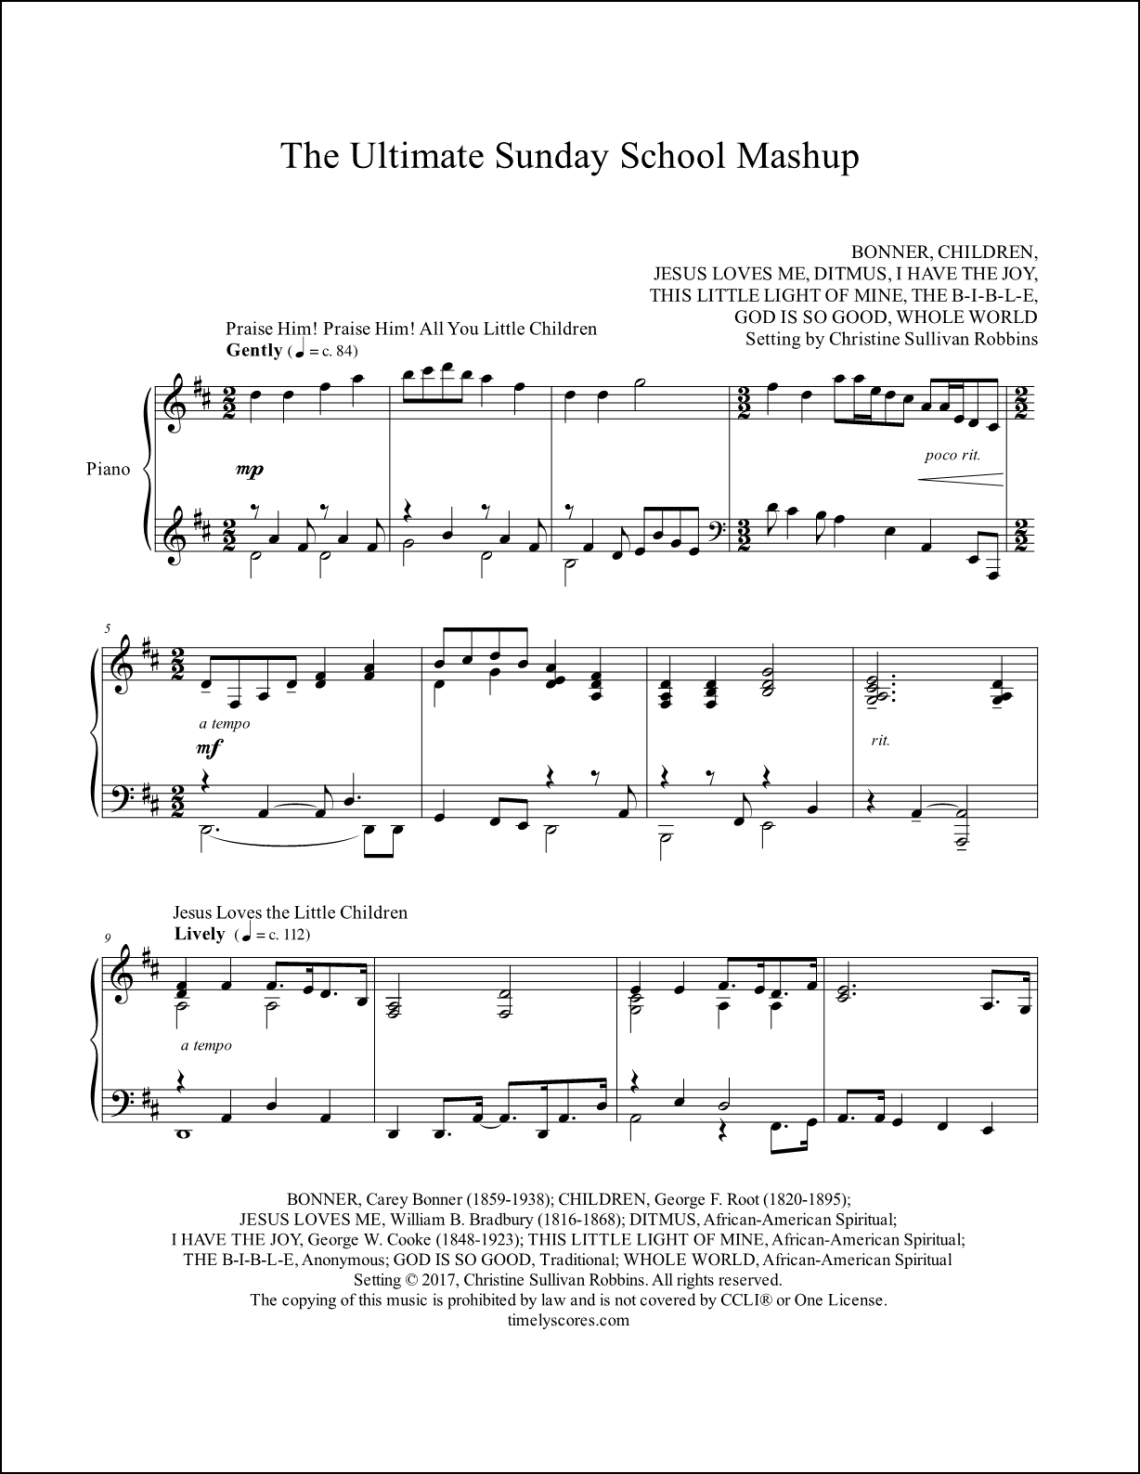 The Ultimate Sunday School Mashup Piano Sheet Music